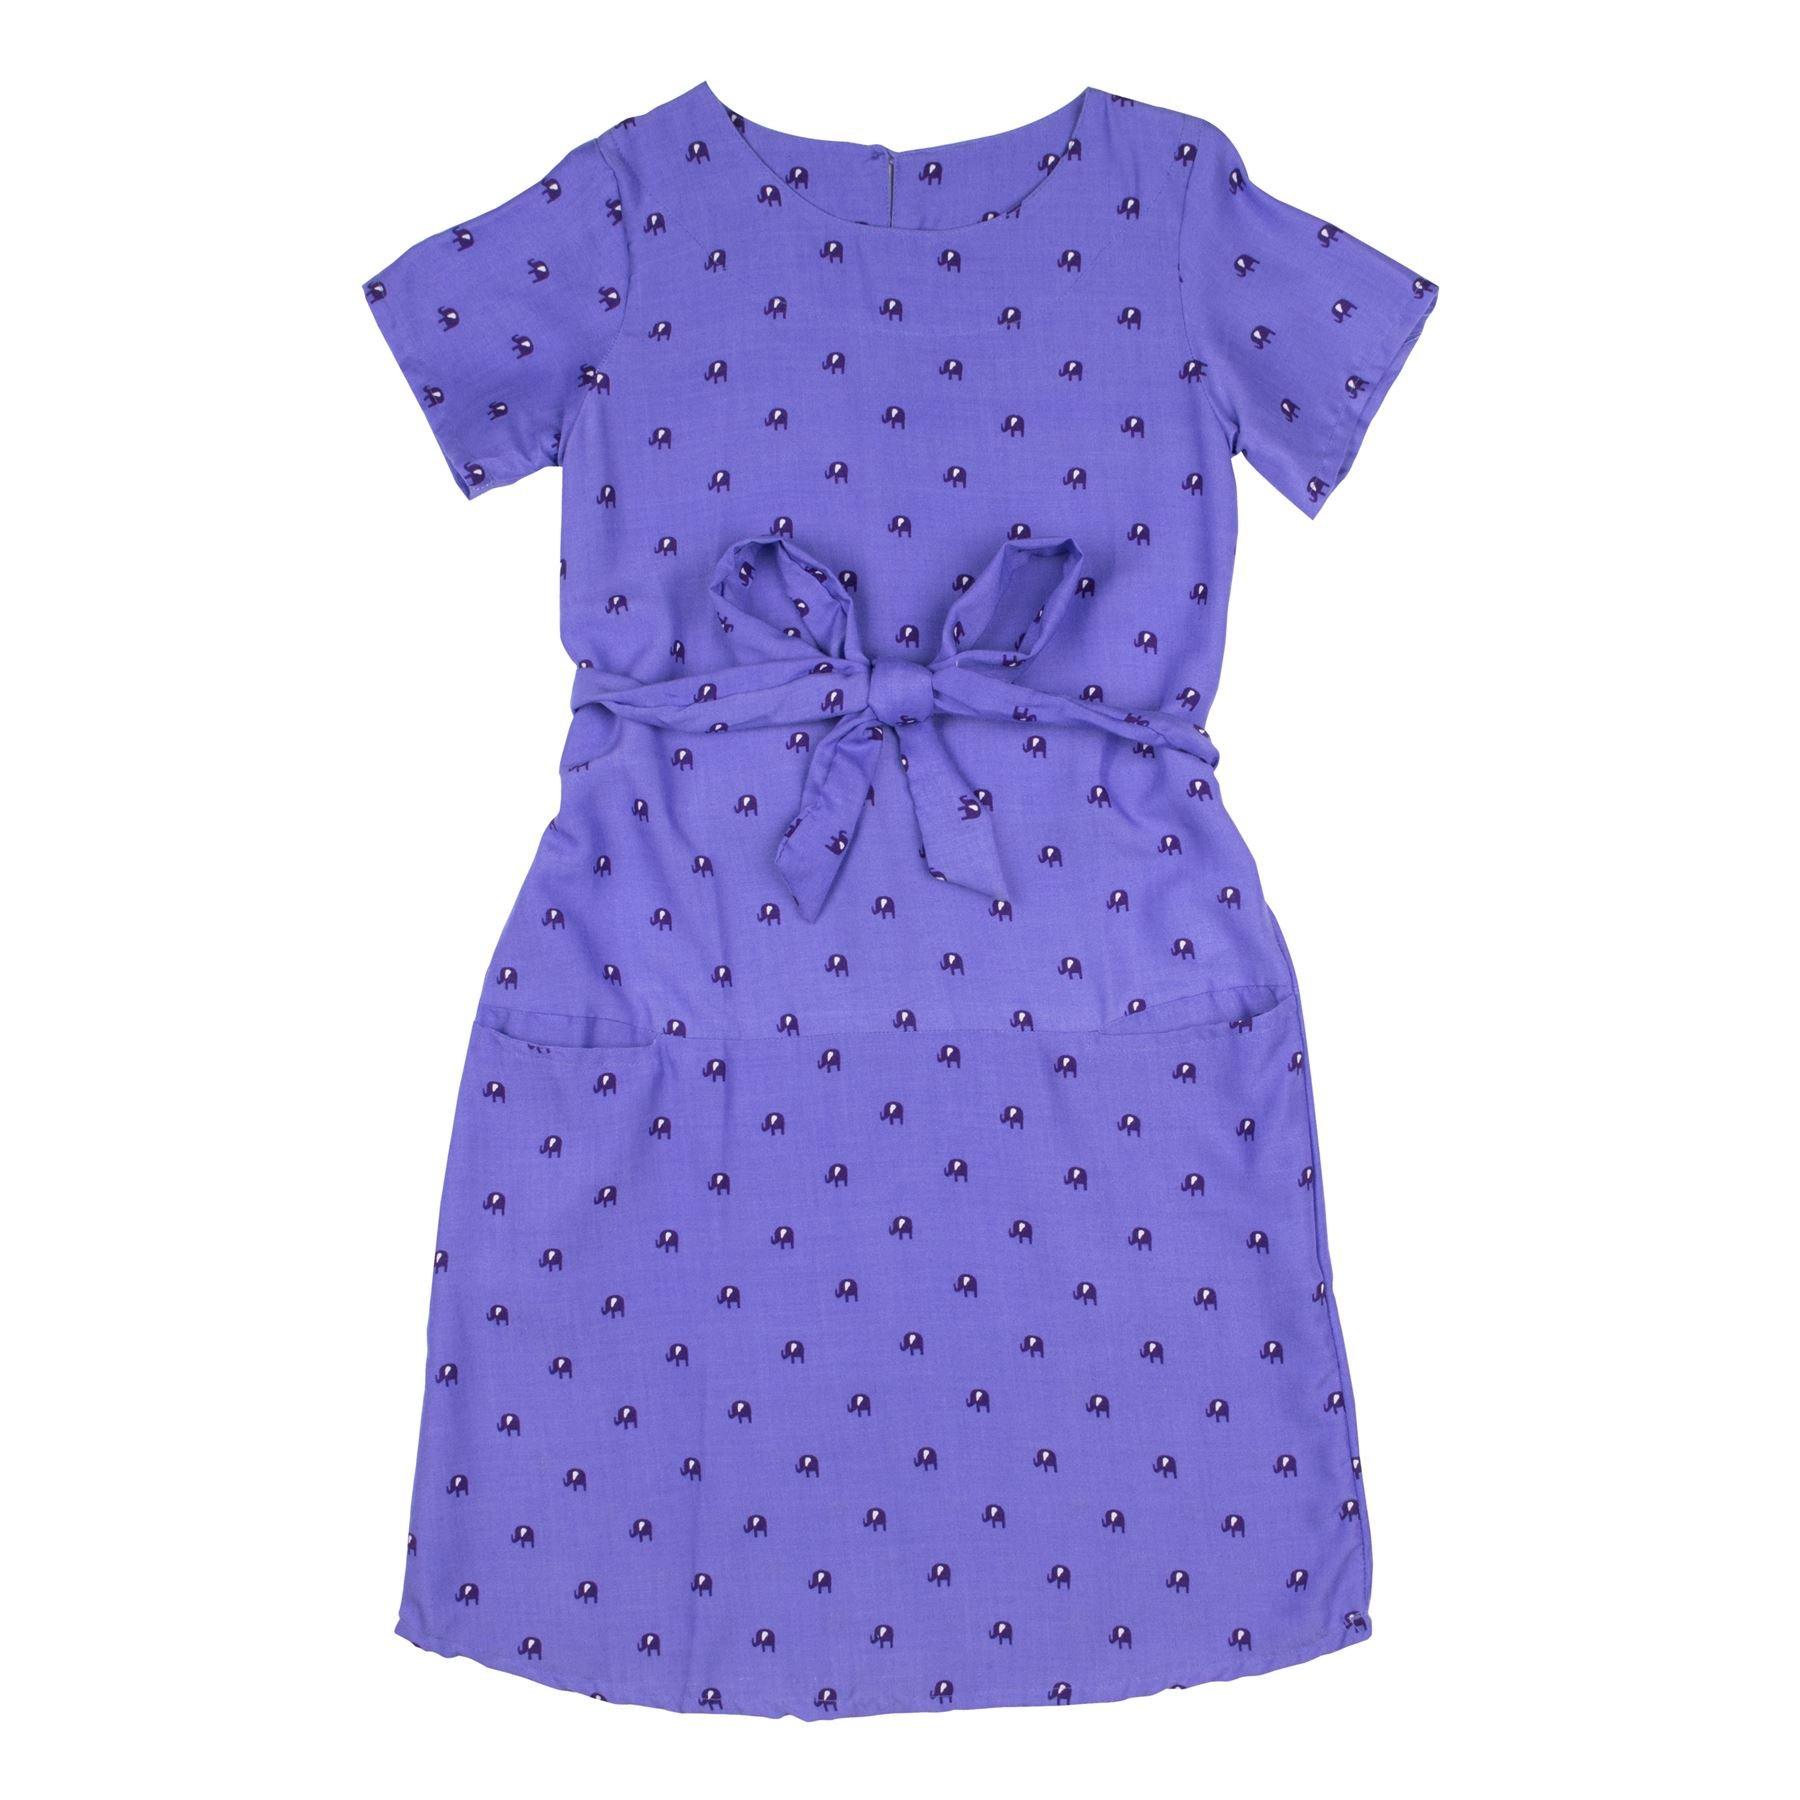 Lofbaz Girls Printed Rayon Casual Dresses Peacock 1 Violet 5/6Y